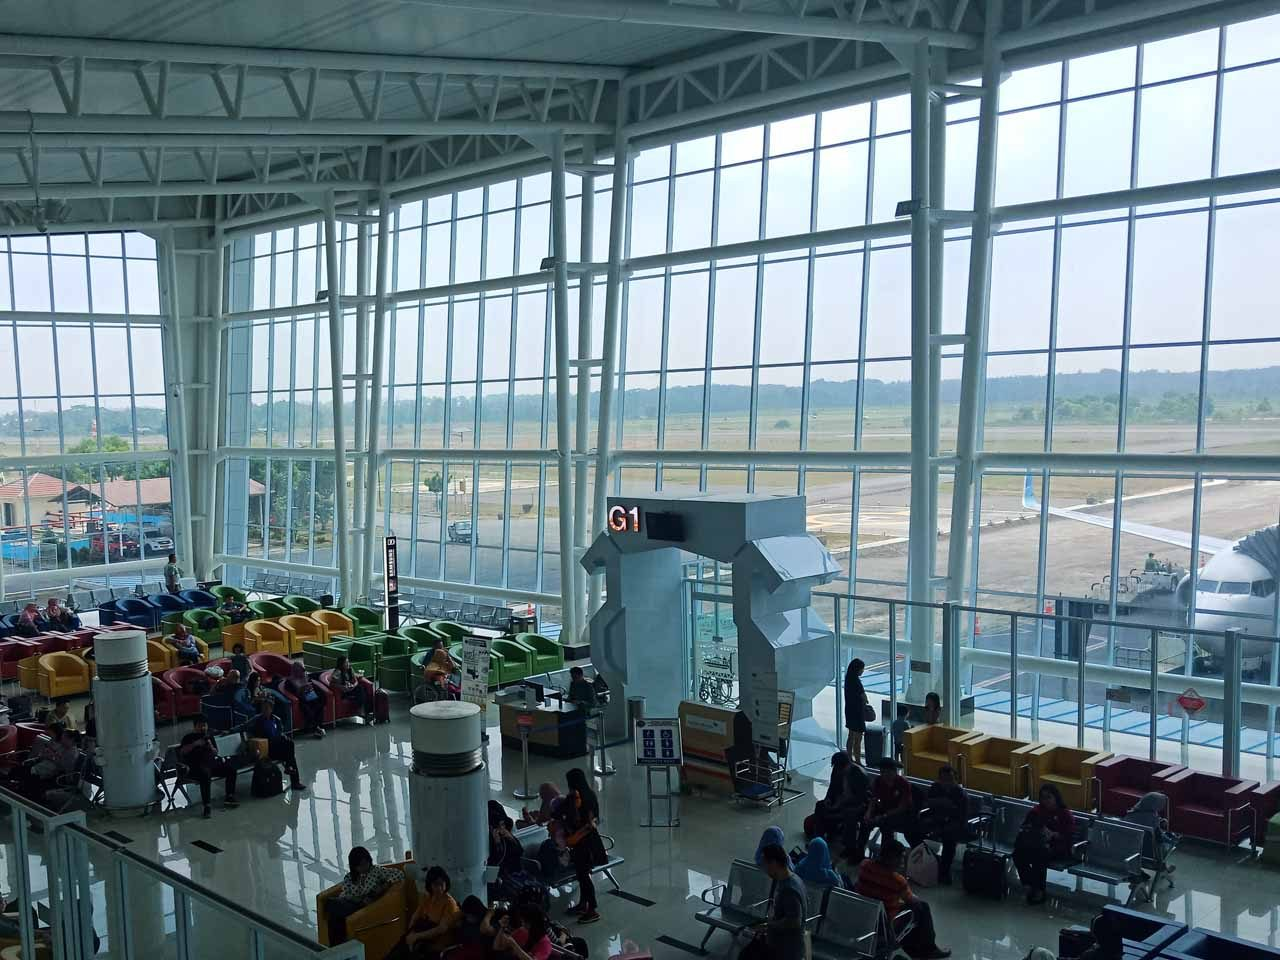 jadwal penerbangan lampung jakarta- jadwal pesawat- harga tiket